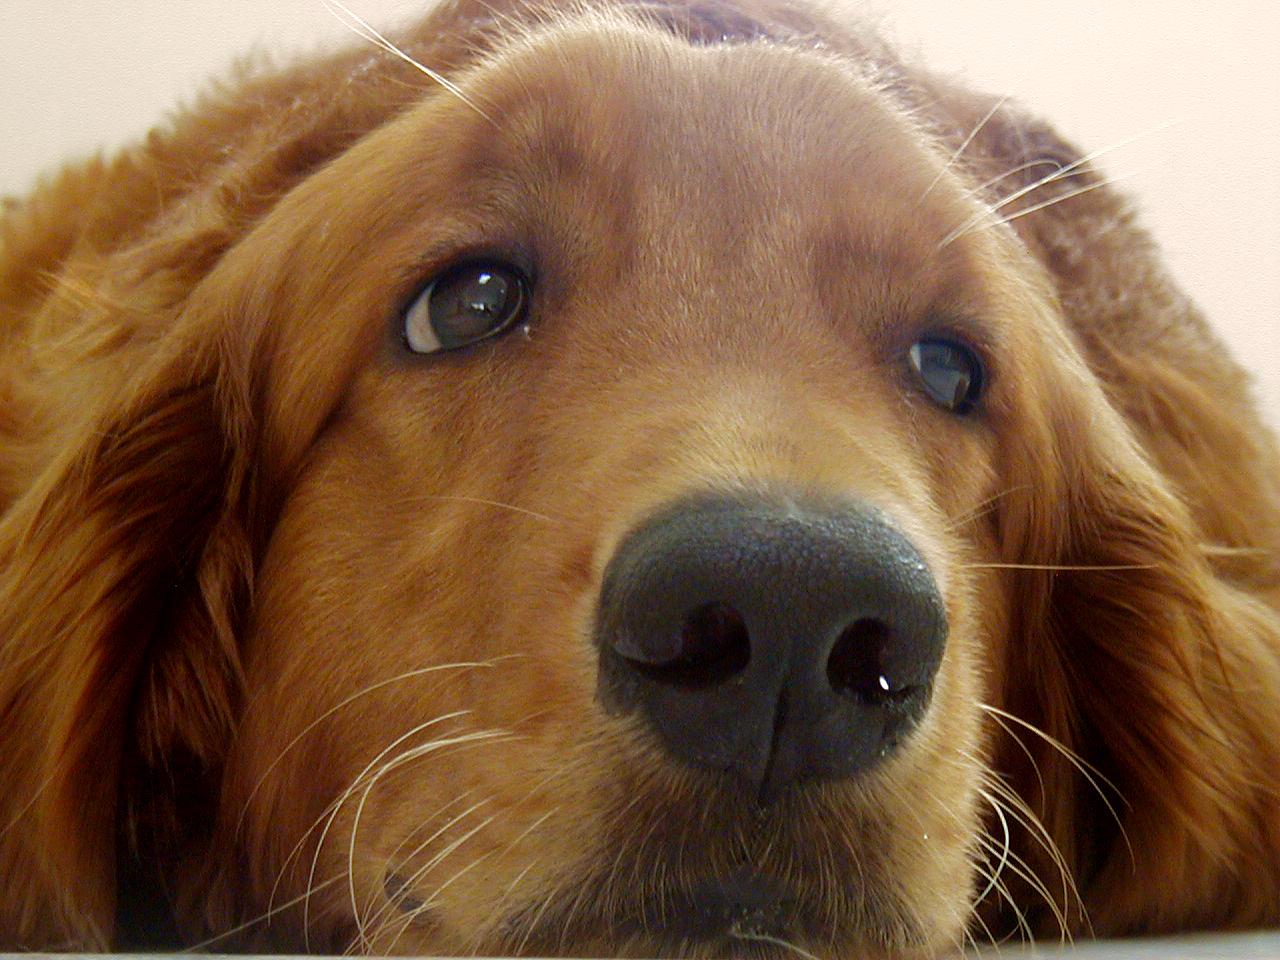 Can Dogs Get Human Flu Virus